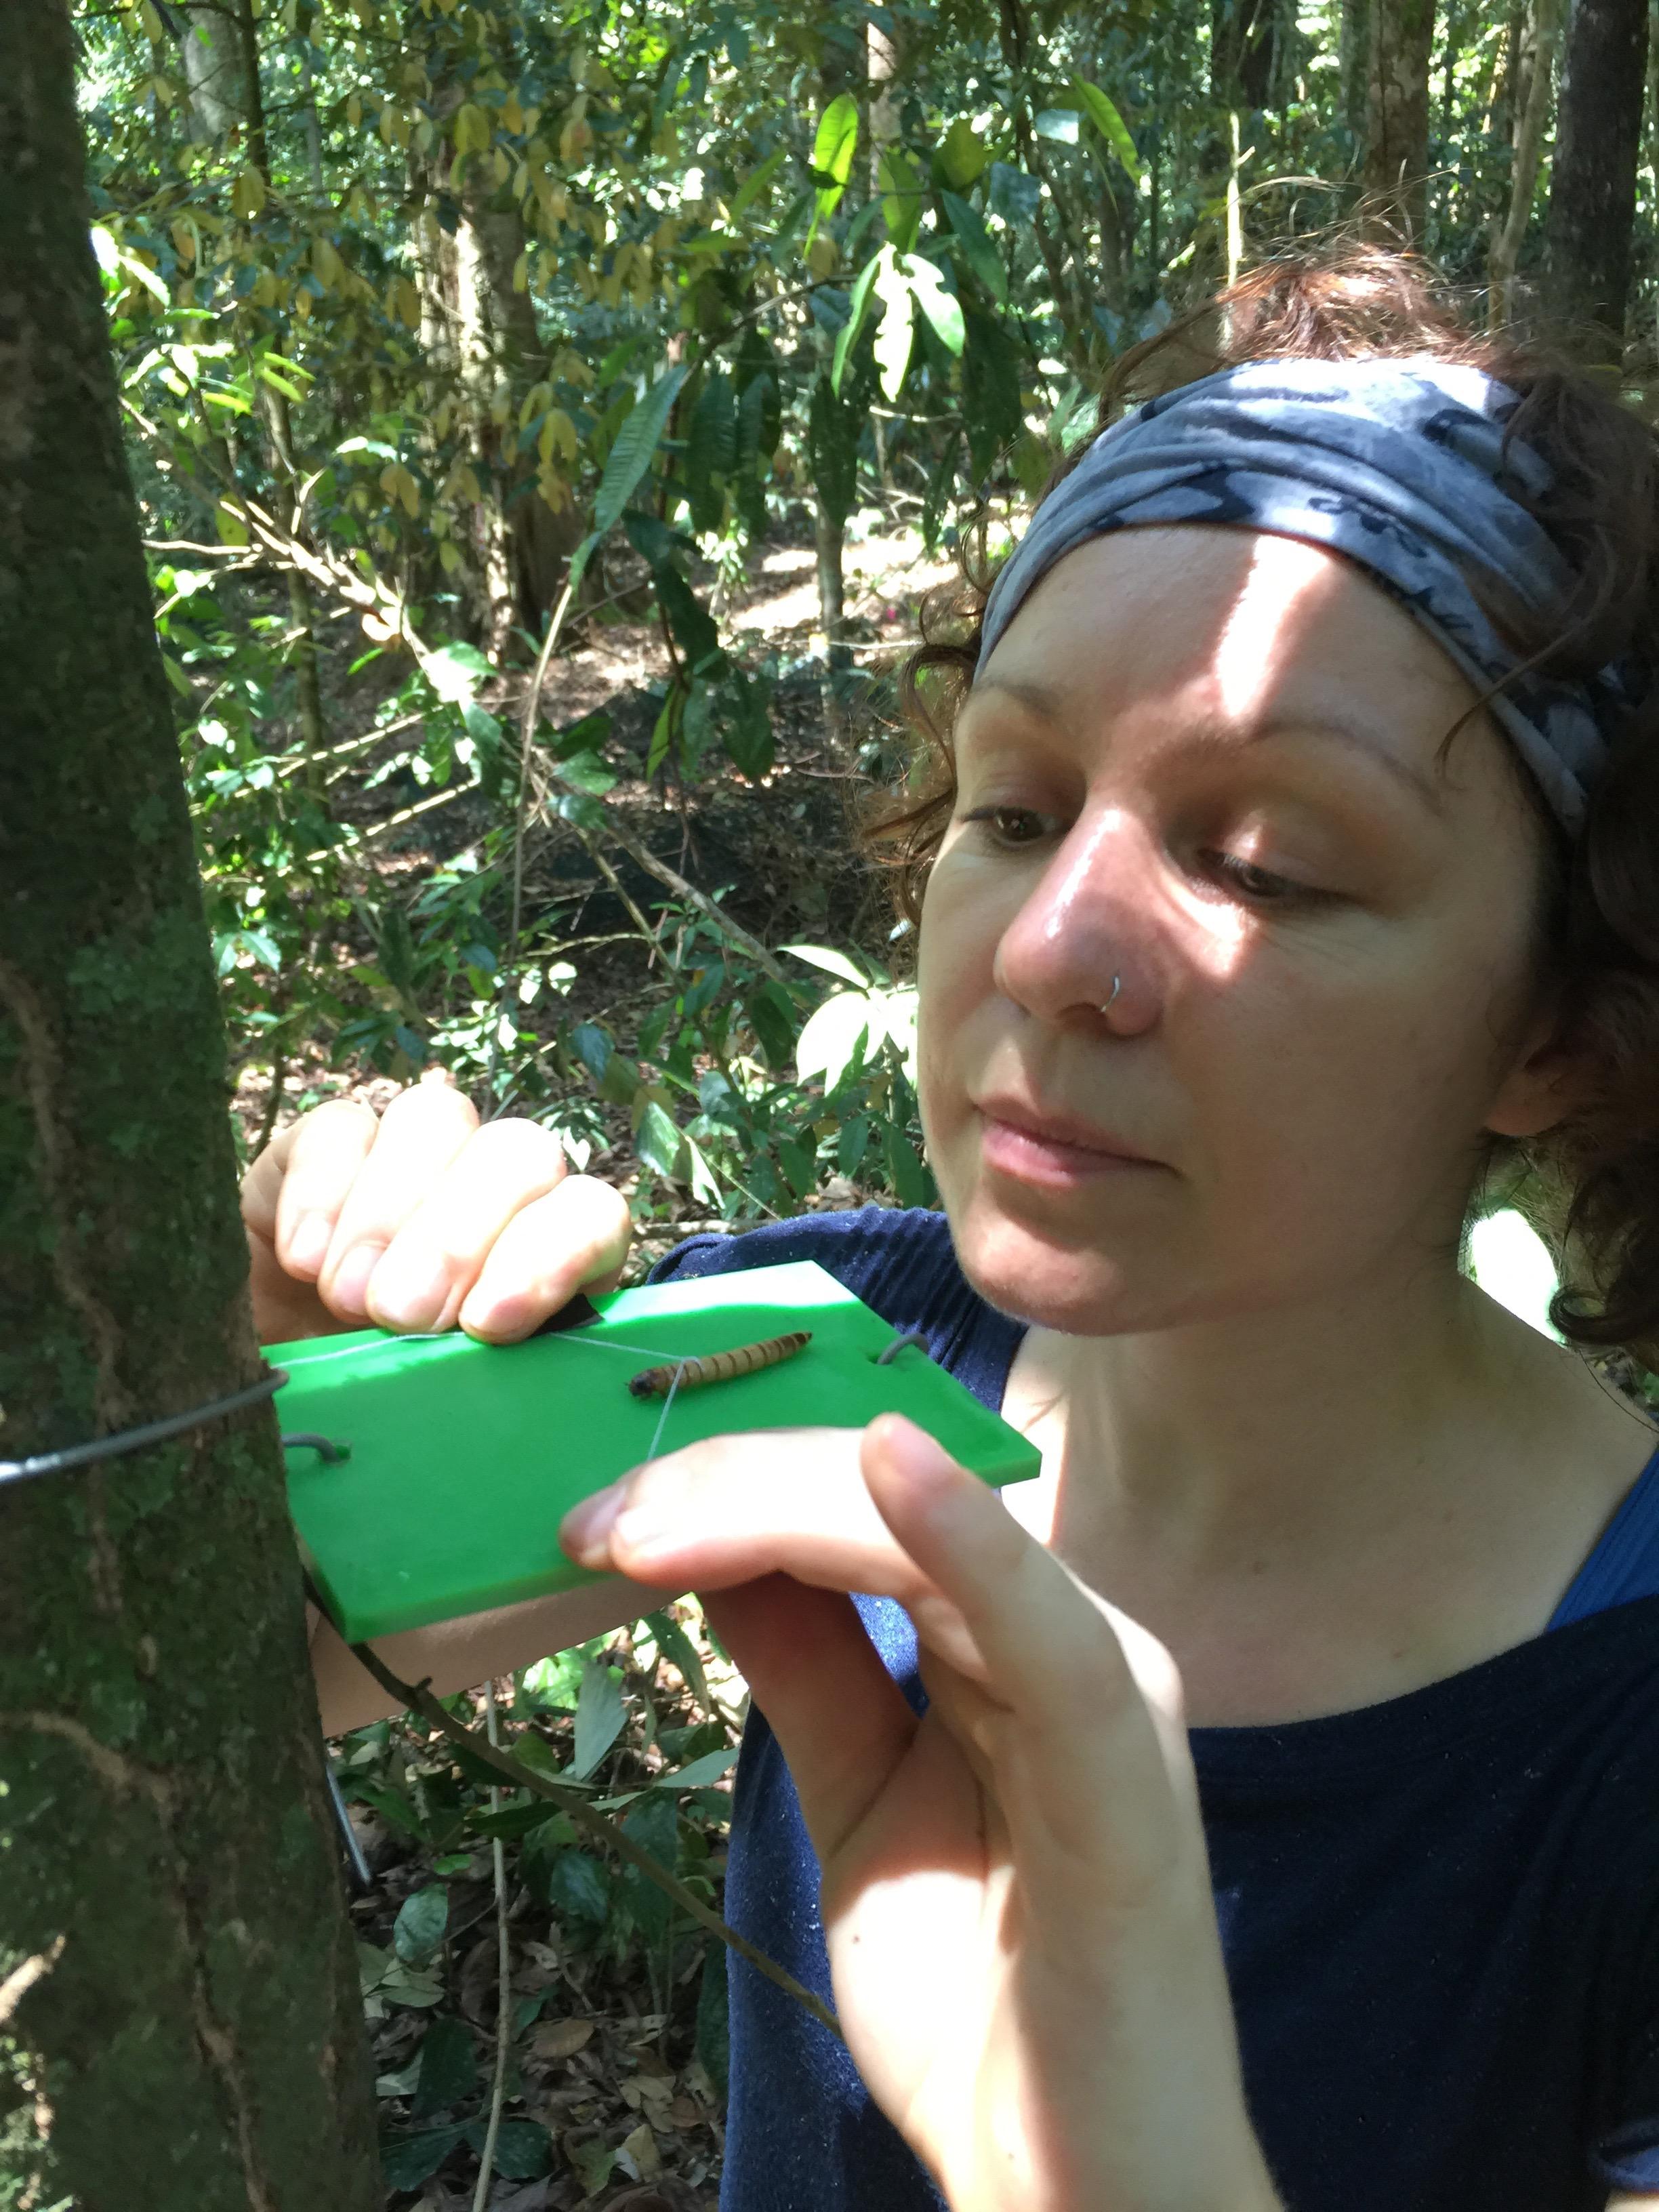 Hannah checks out a mealworm